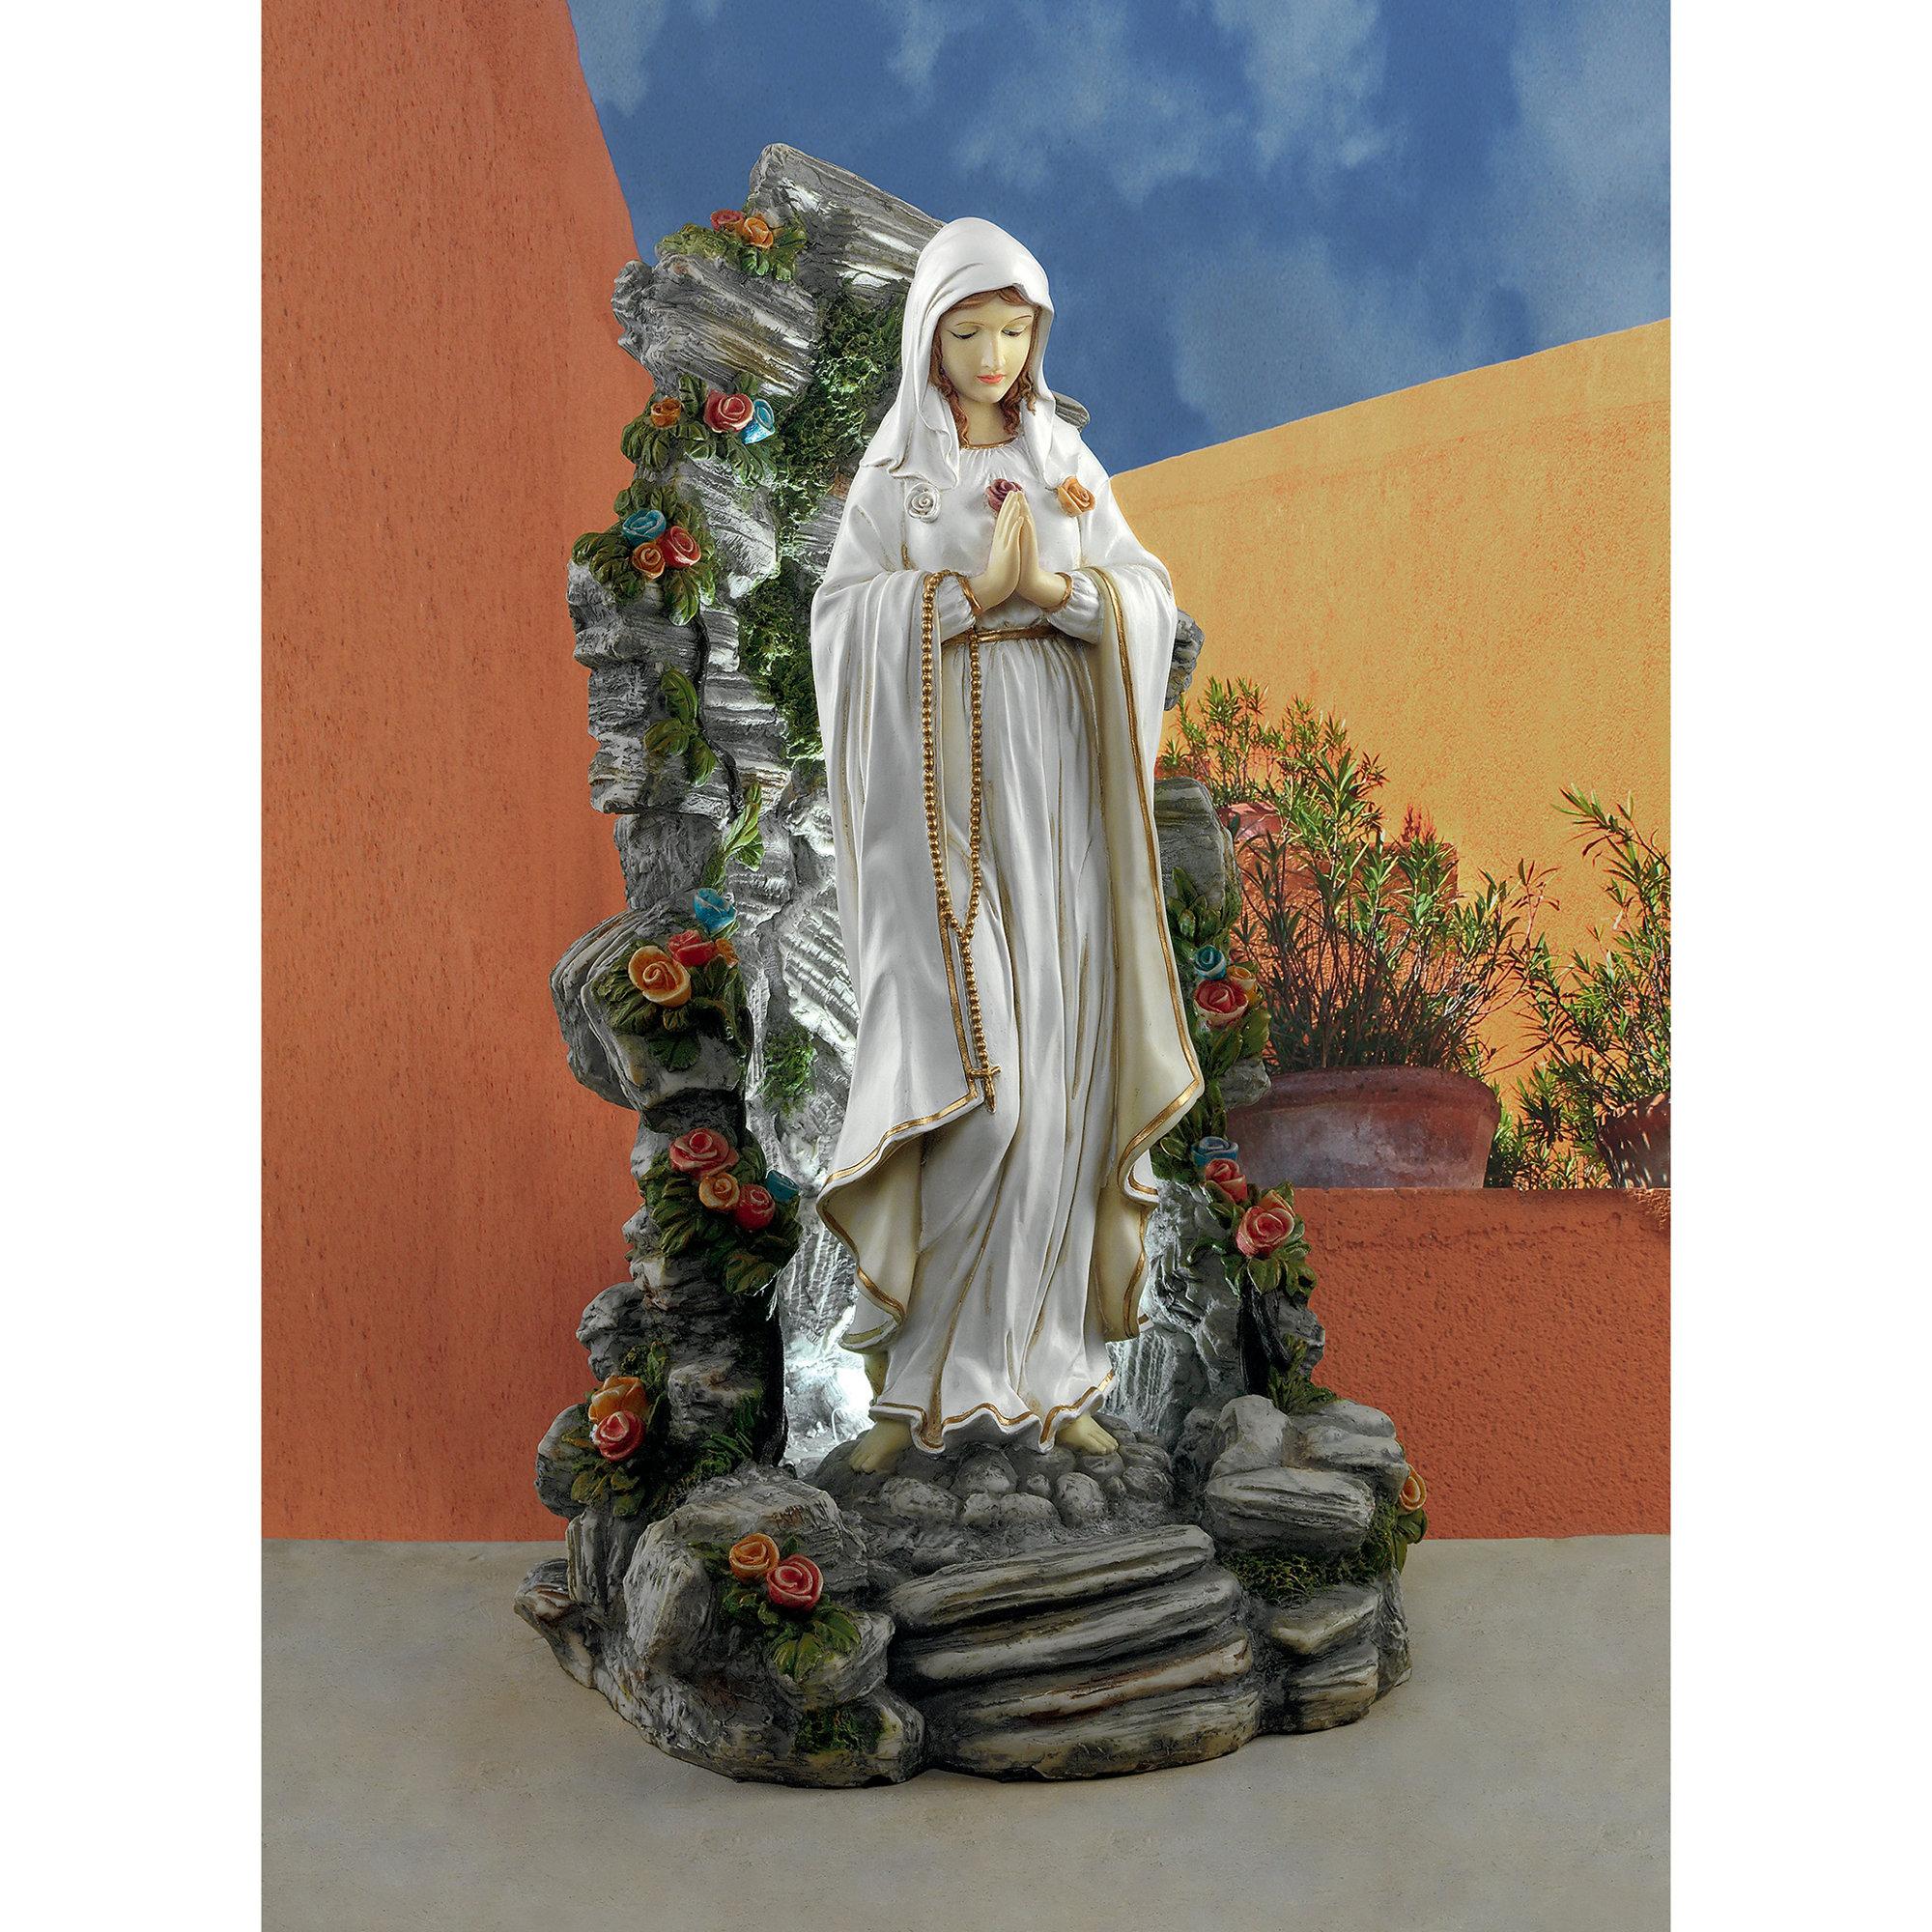 Design Toscano Blessed Virgin Mary Illuminated Garden